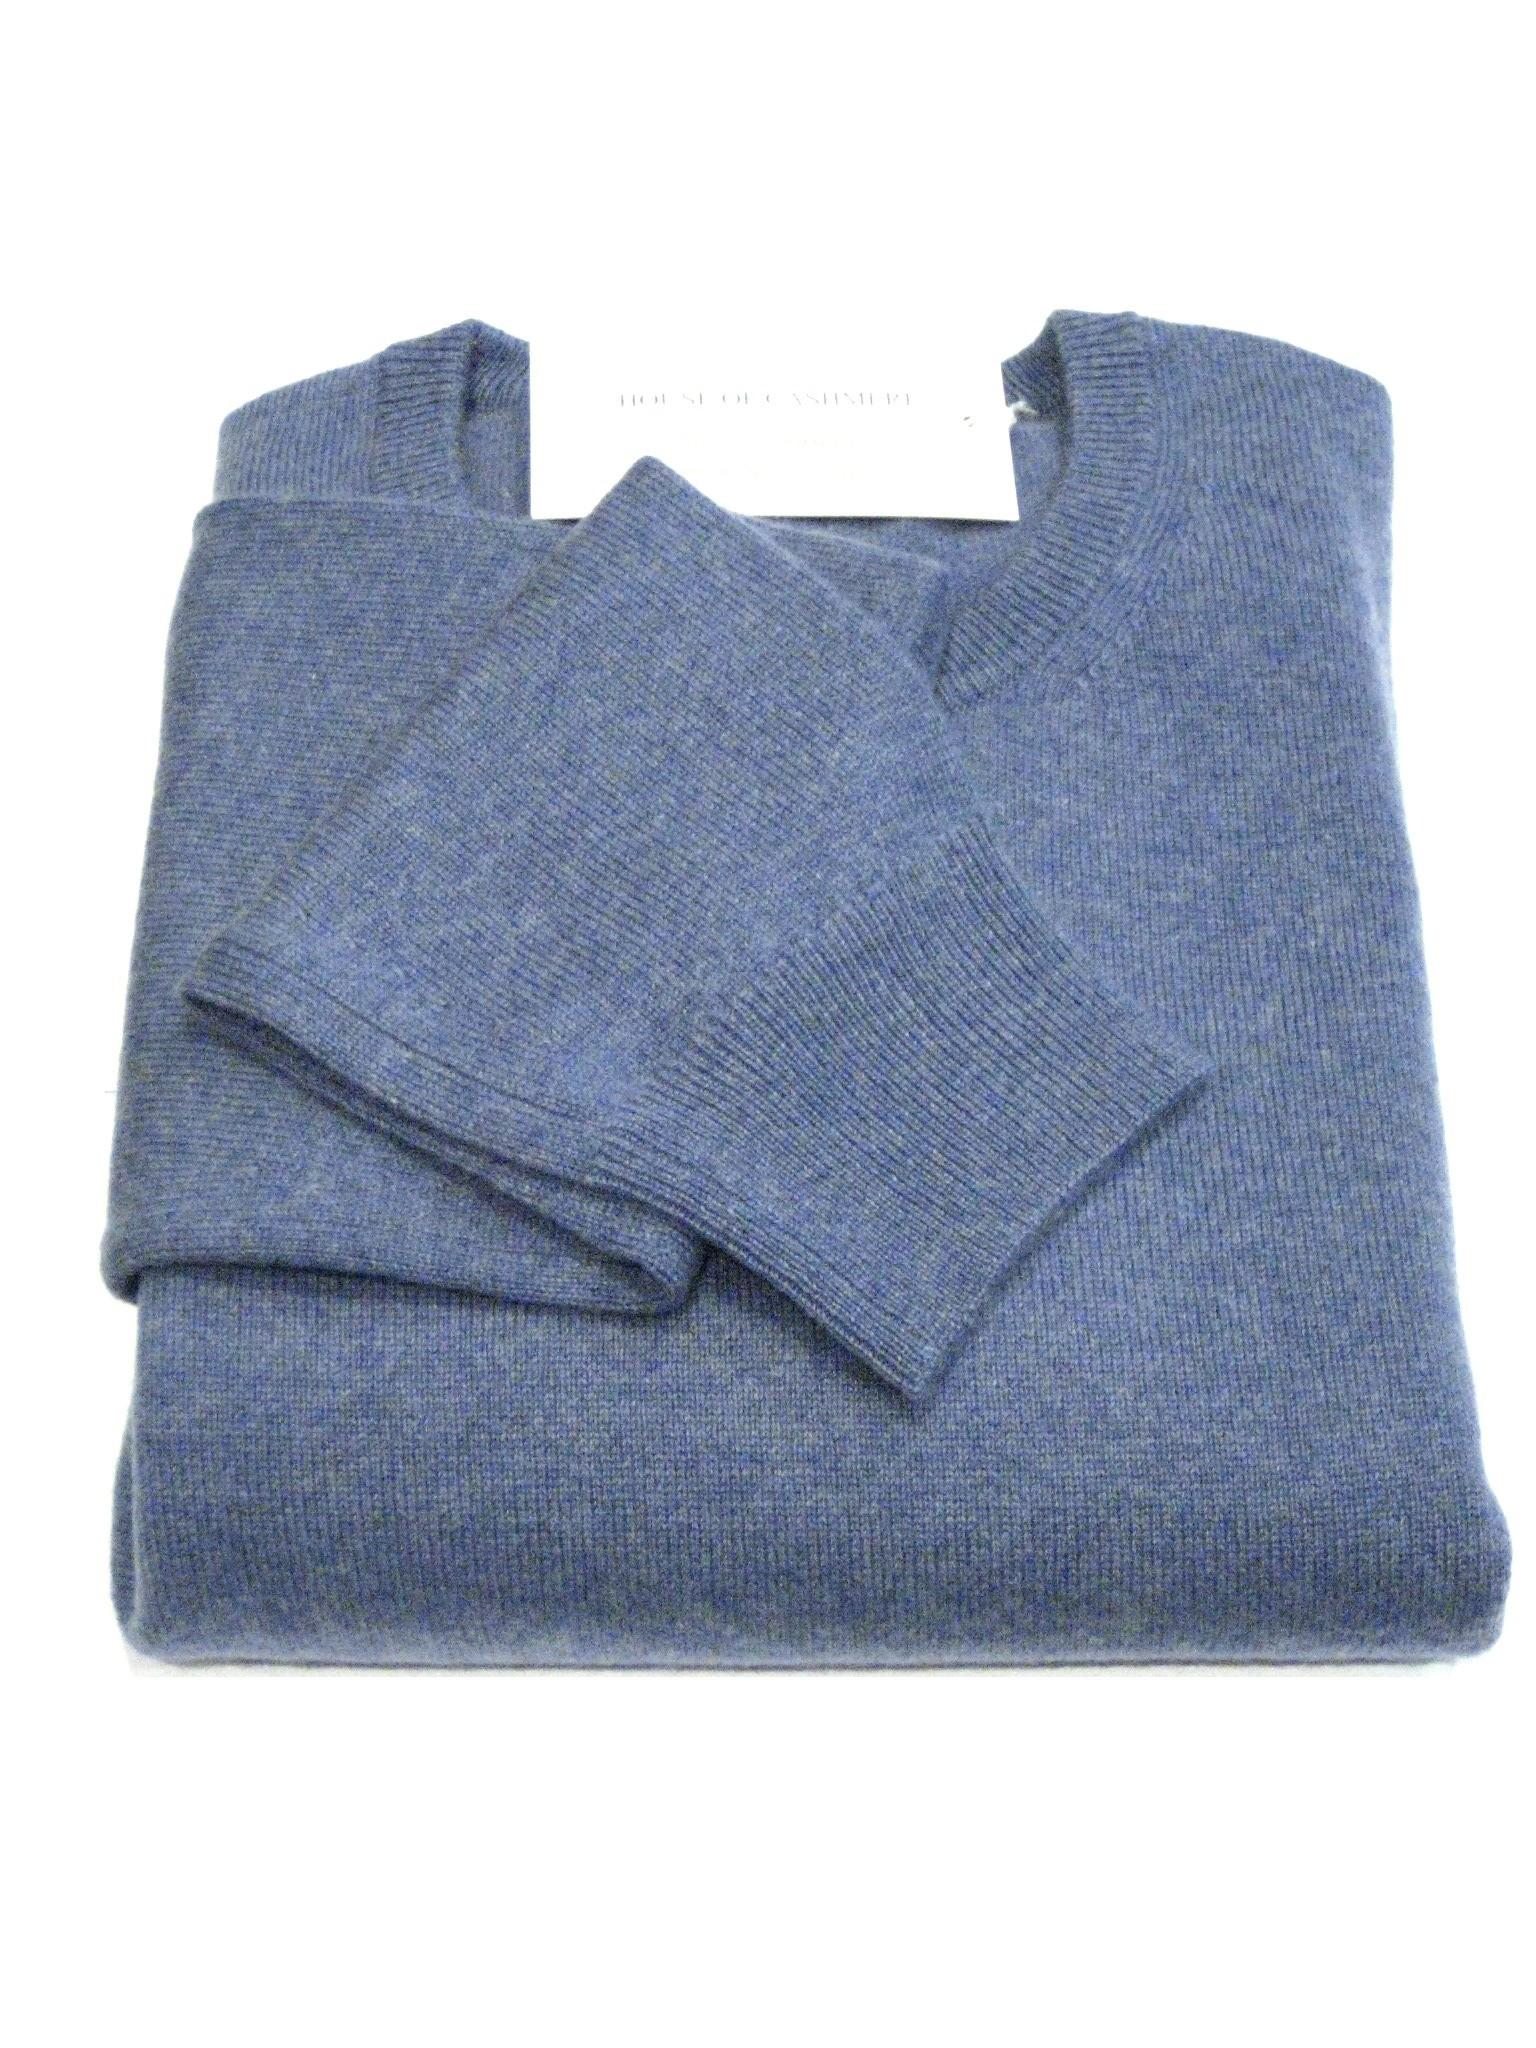 Denim Men's Crew Sweater - 100% Cashmere Made in Scotland